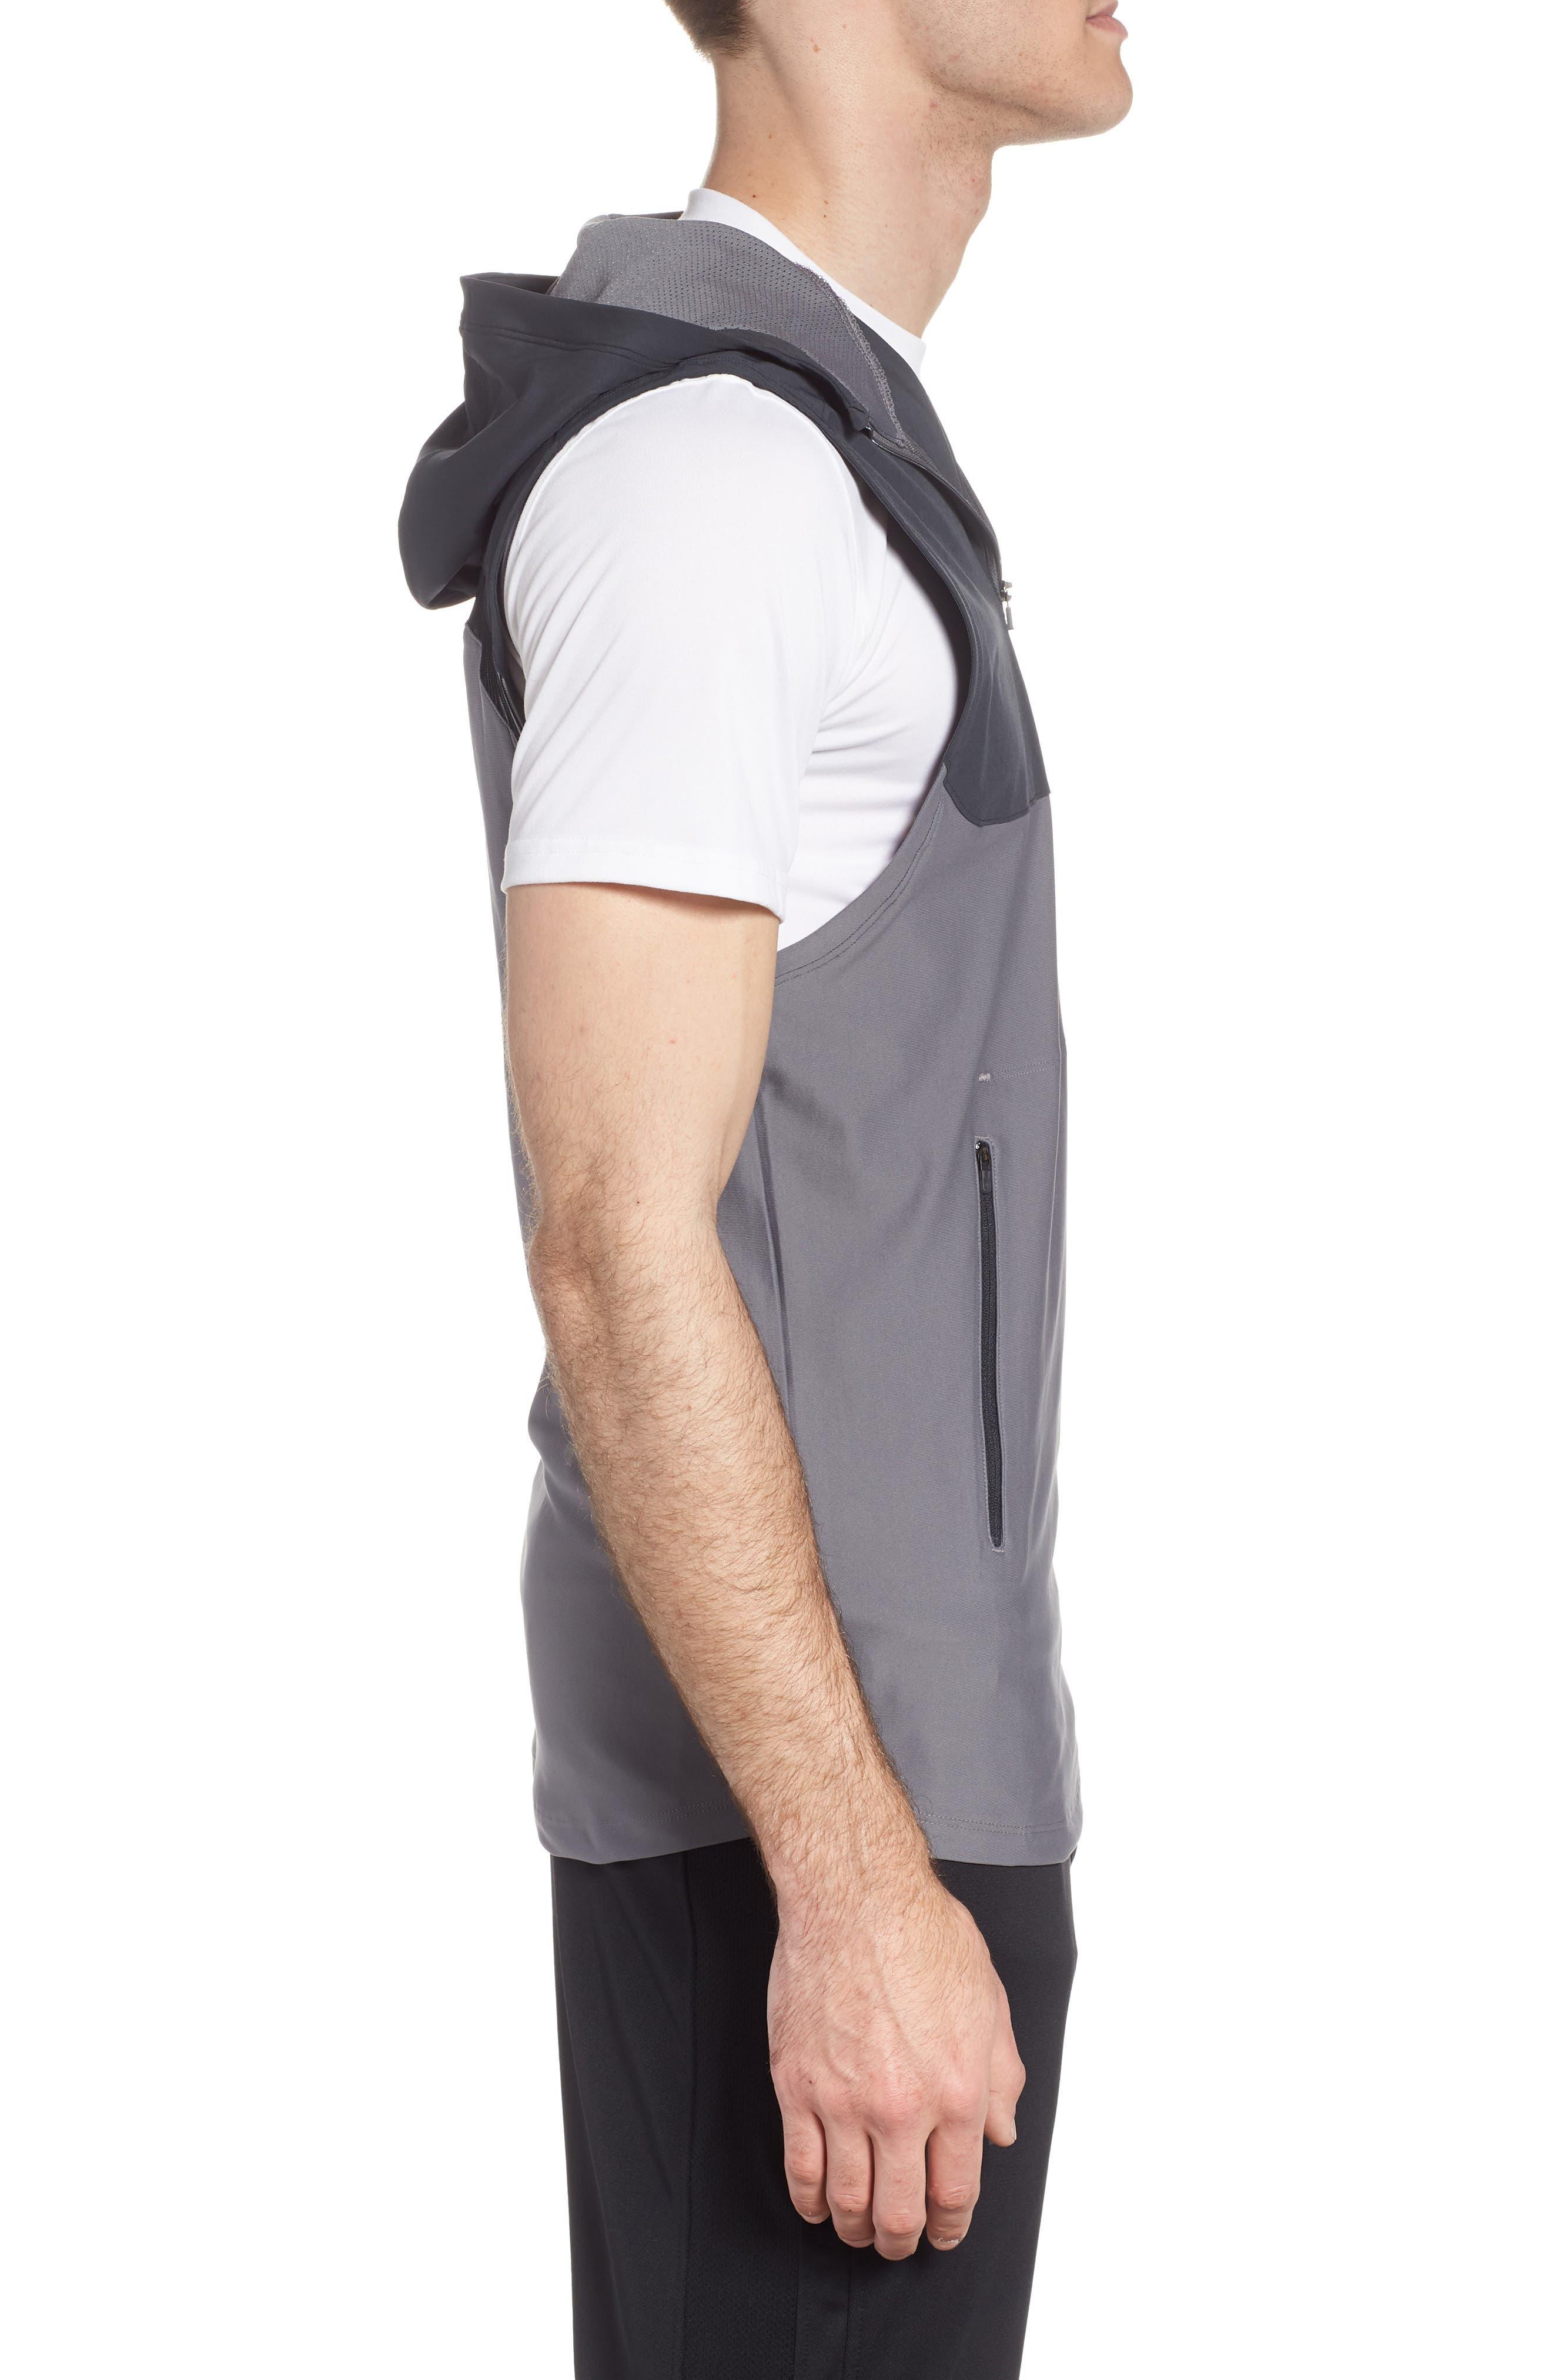 Threadborne Vanish Vest,                             Alternate thumbnail 3, color,                             Anthracite / Graphite/ Iron